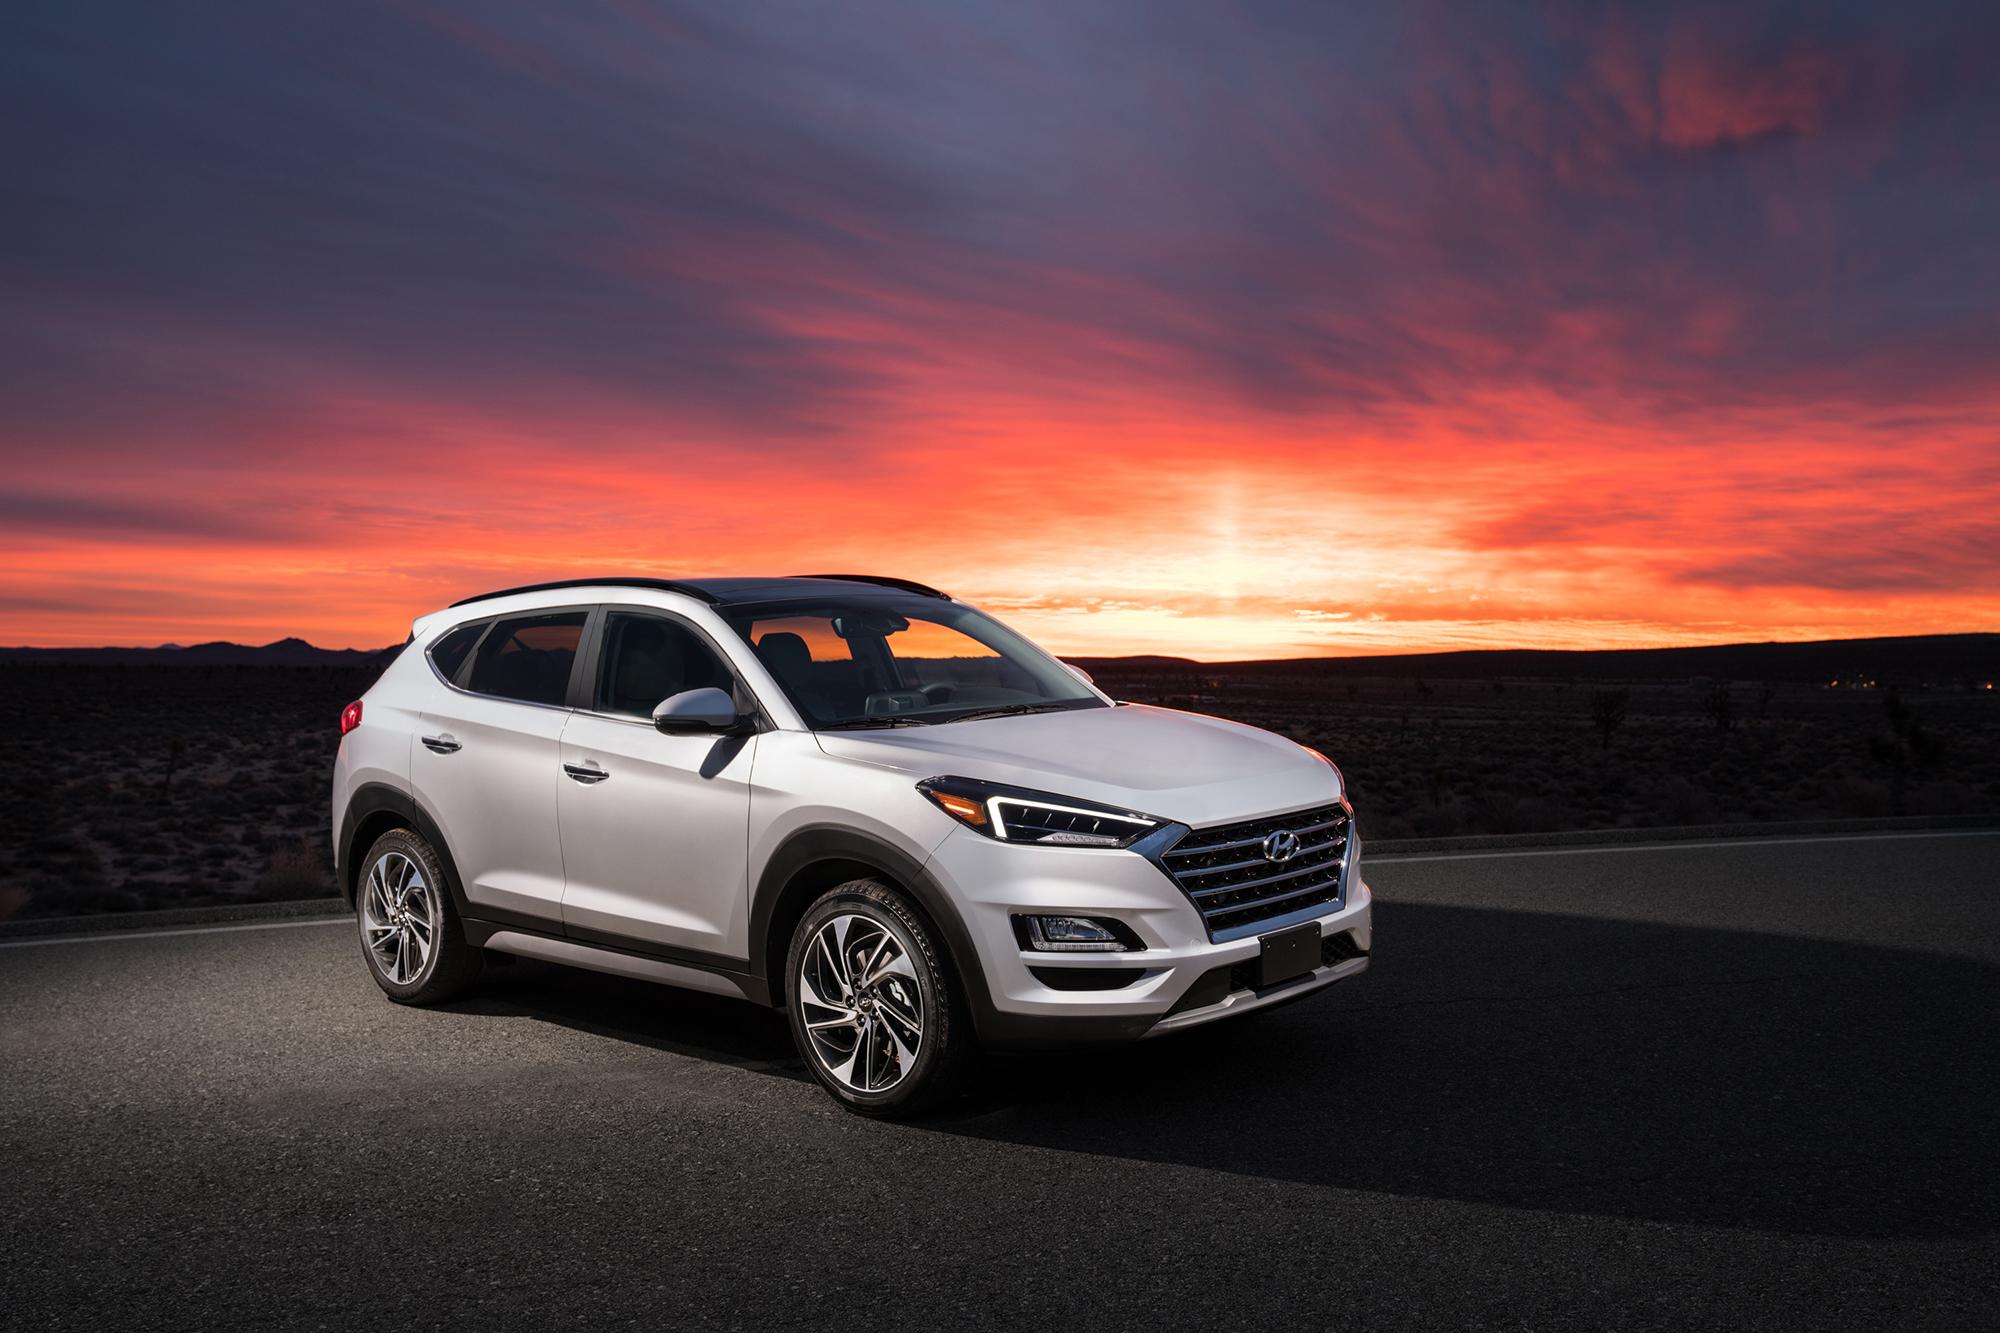 Hyundai-Tucson-2020-exterior-white-outside-sunset